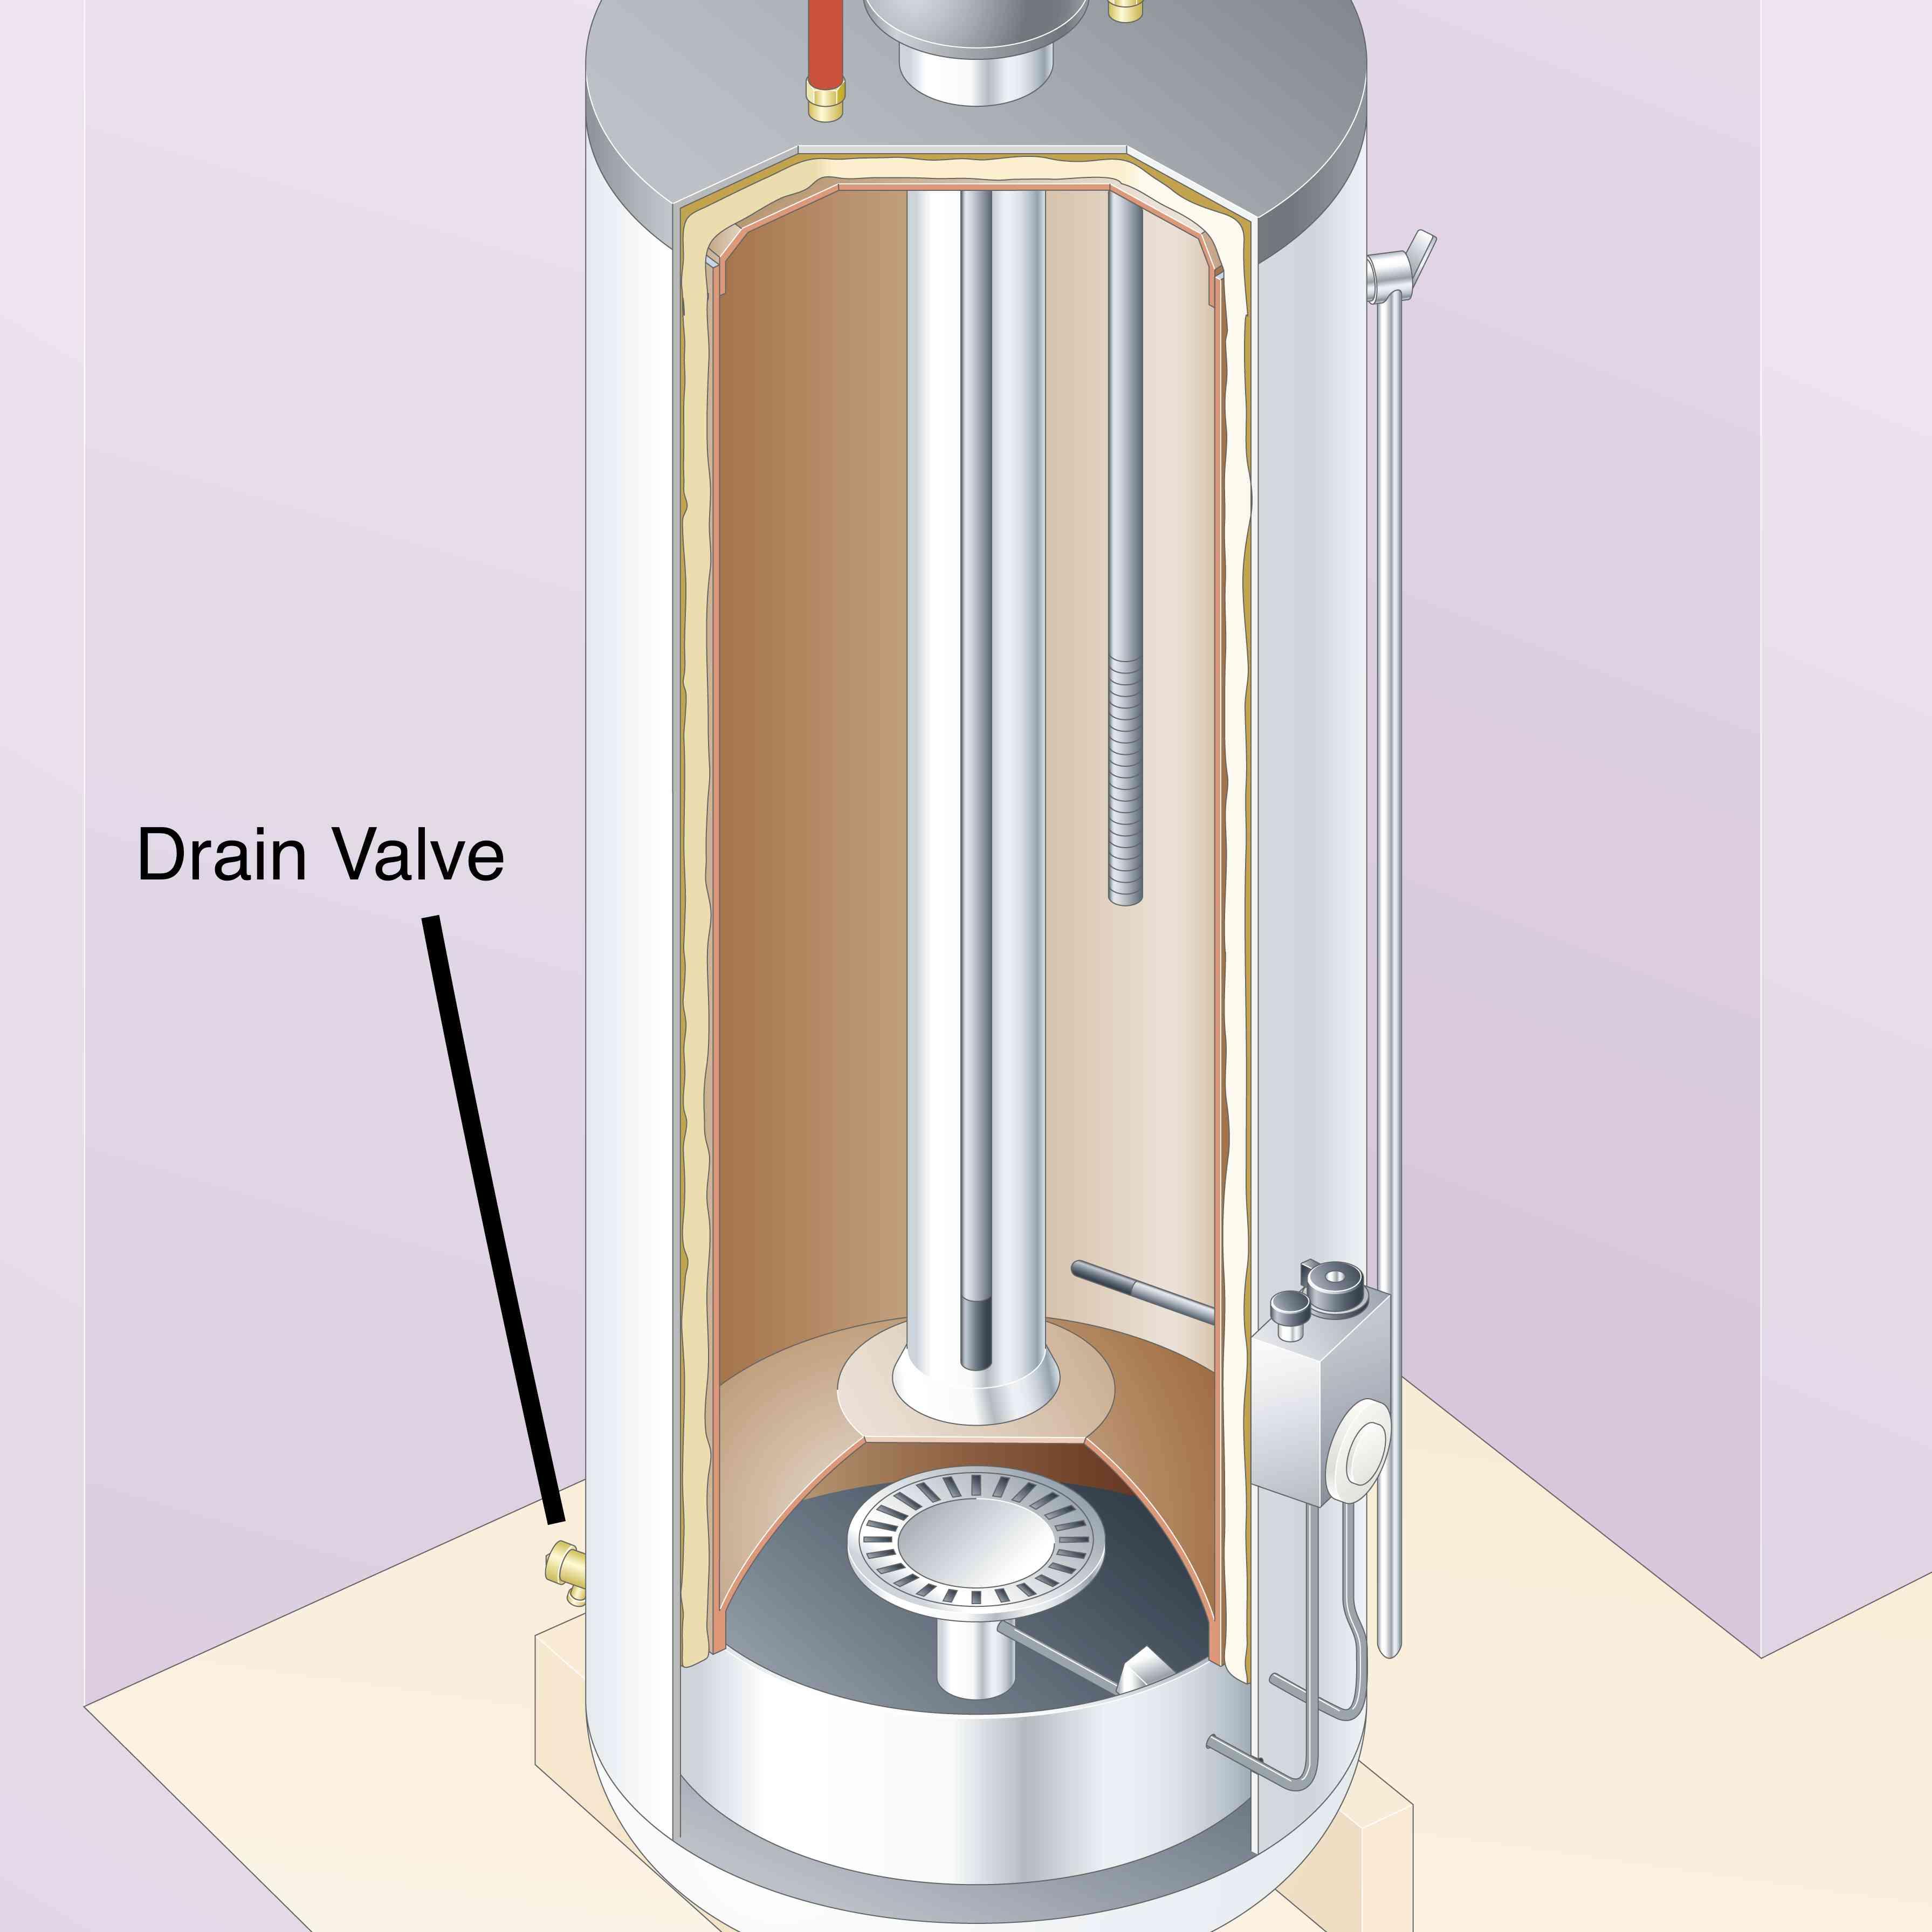 Inside of gas hot water heater, drain valve